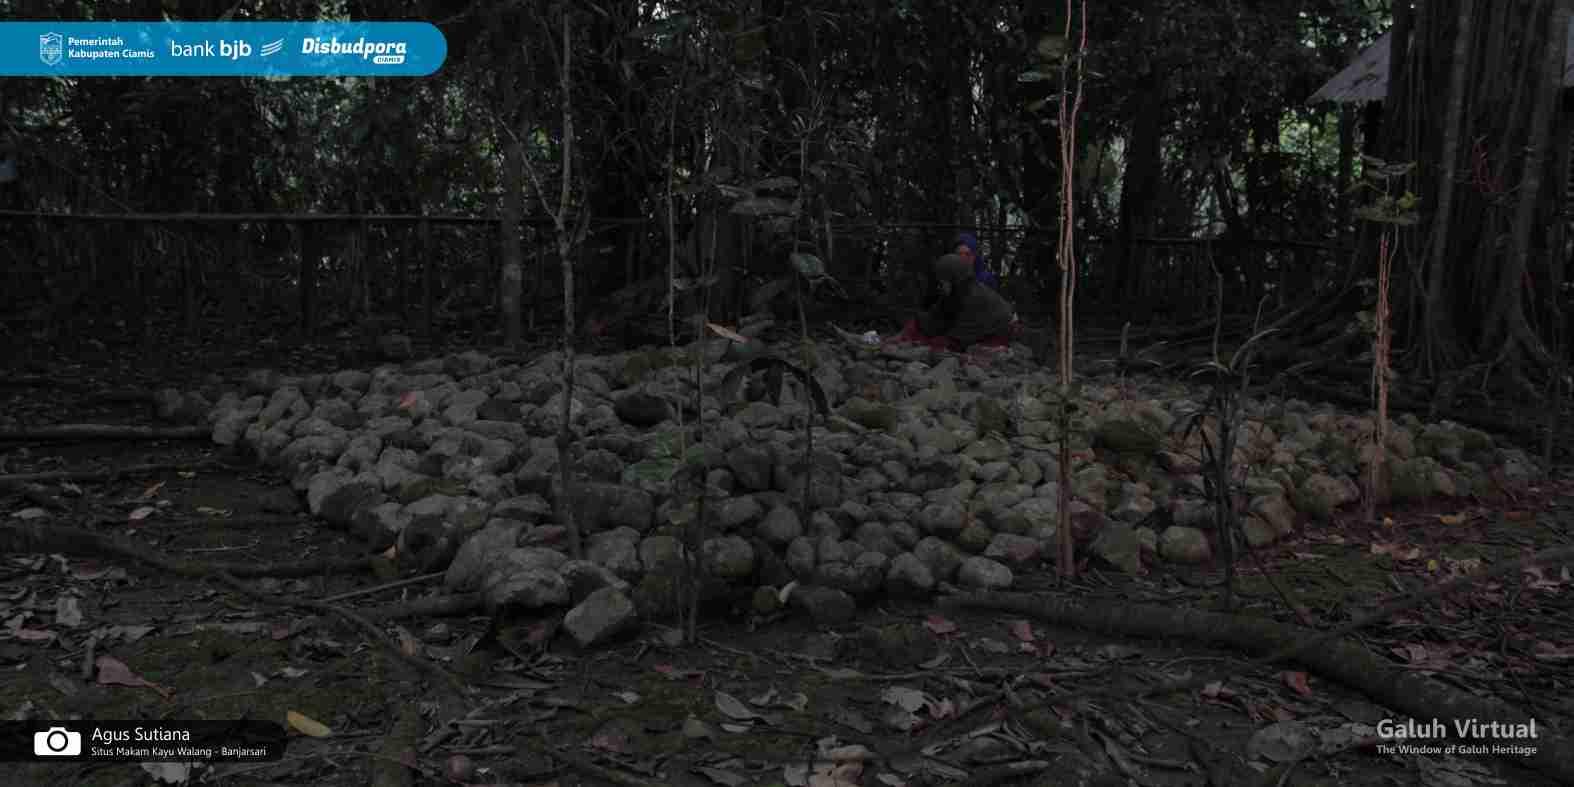 Situs Makam Kayu Walang - Banjarsari